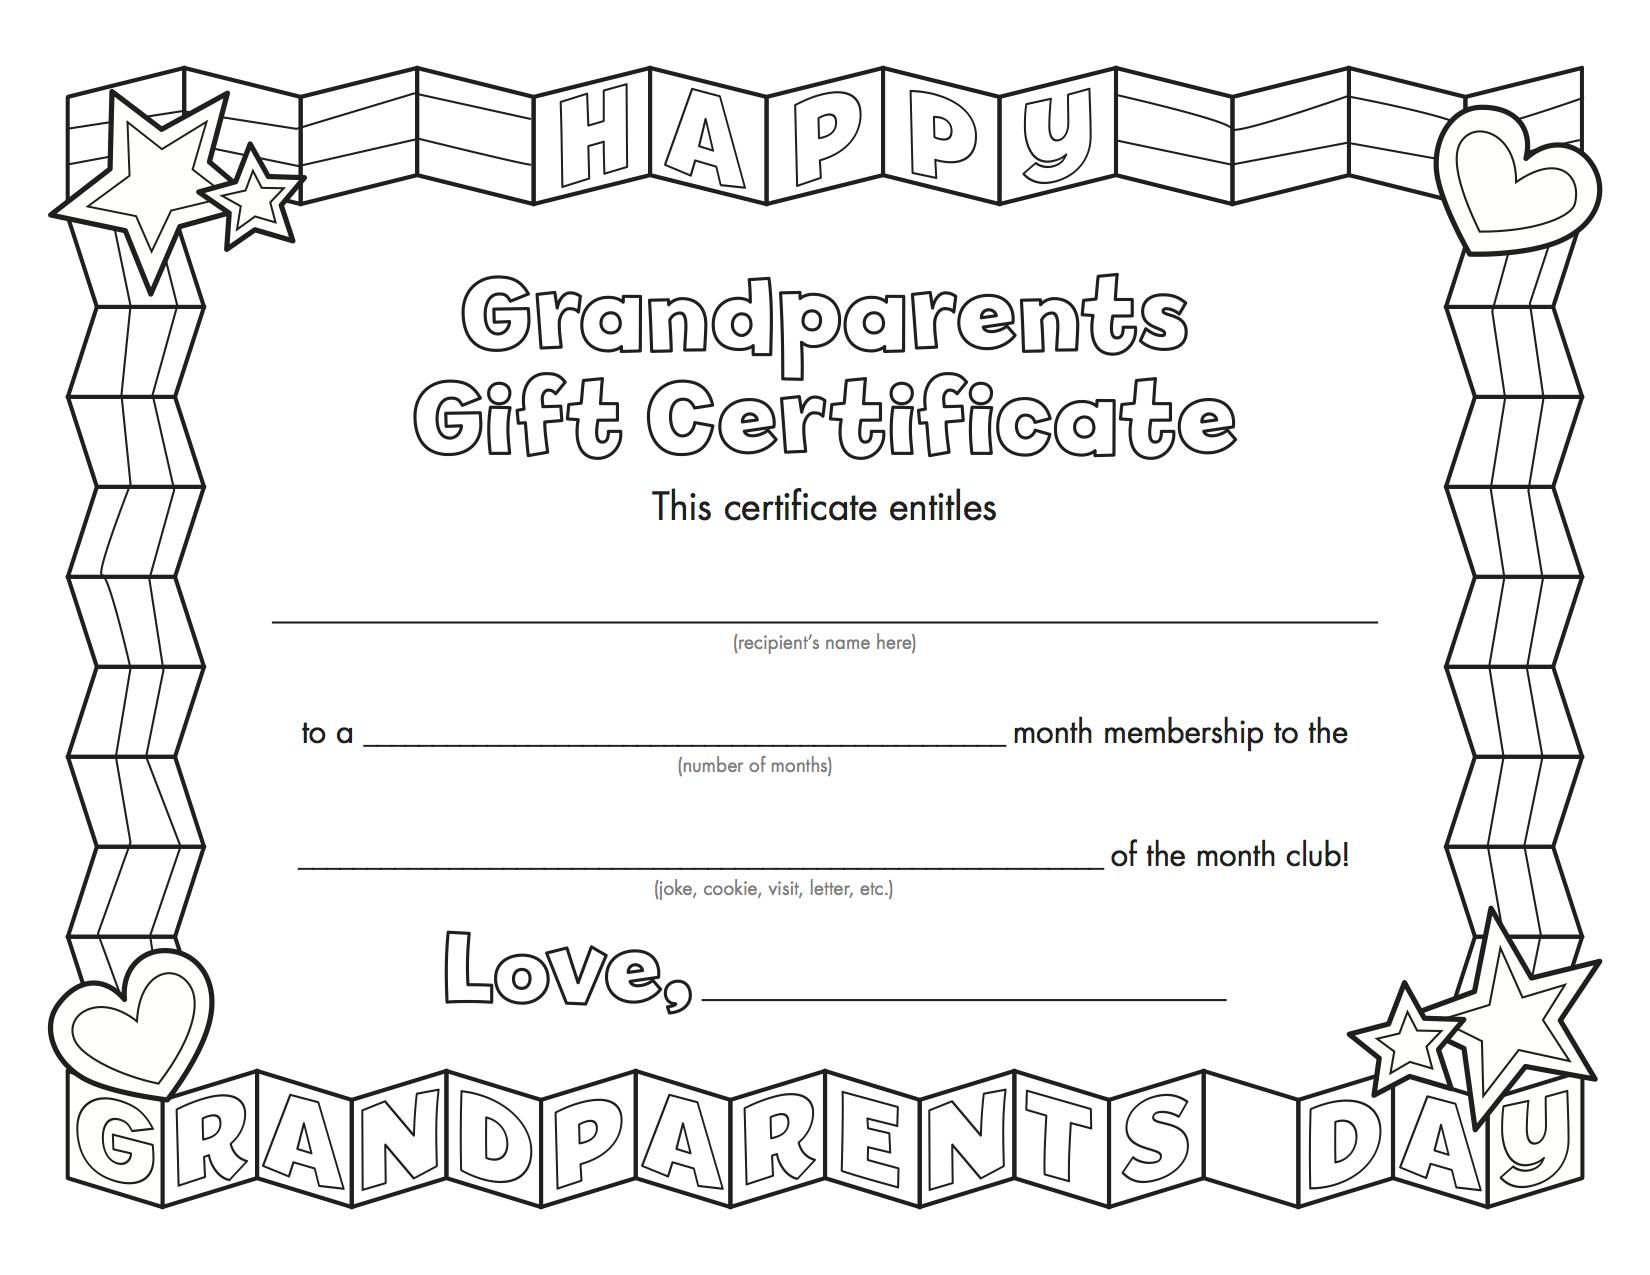 Grandparentsday_Copy | Grandparents Day | Grandparents Day - Grandparents Certificate Free Printable